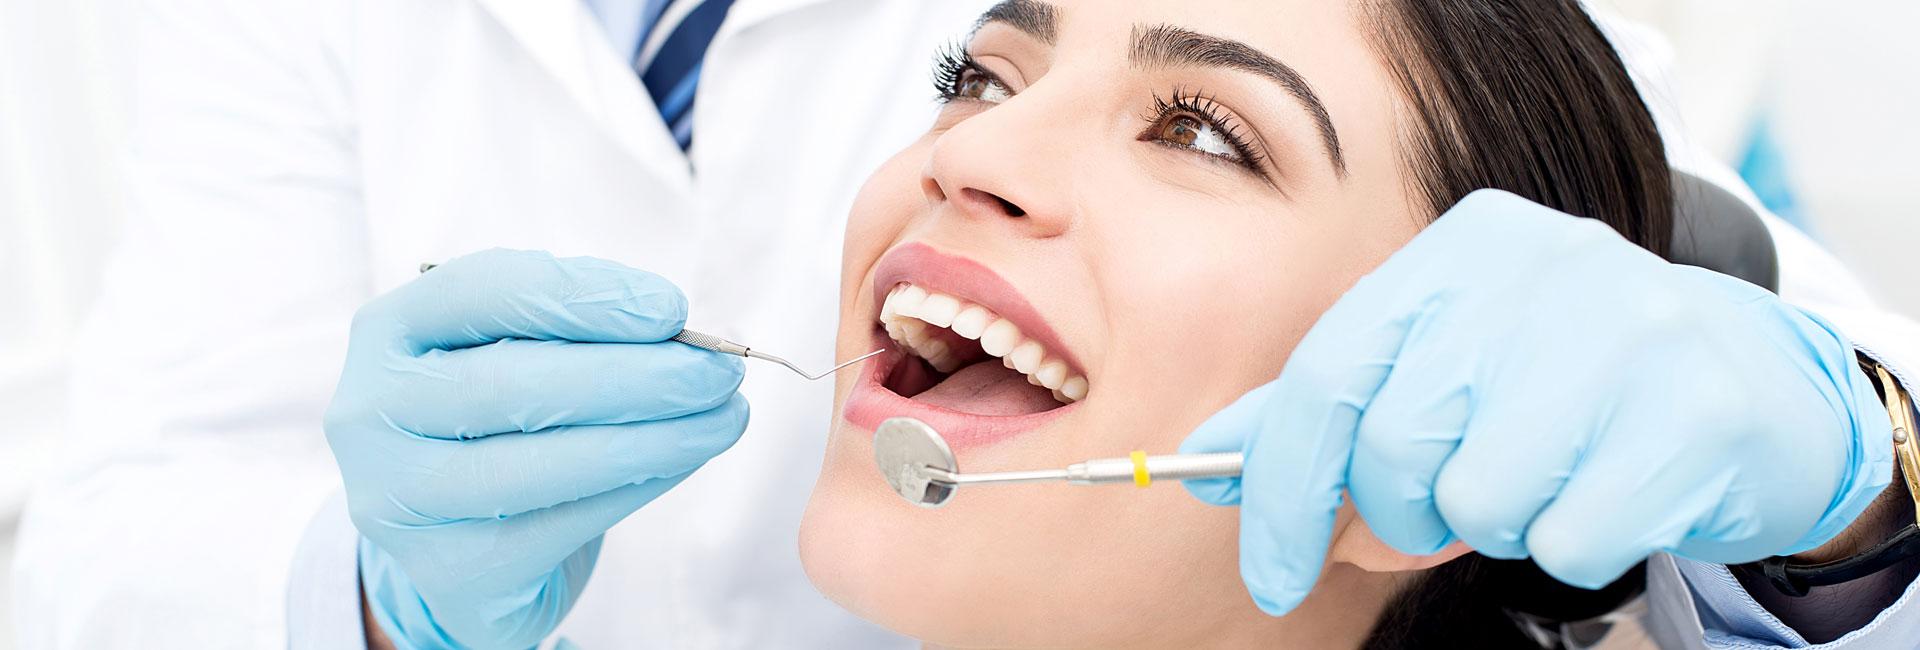 Dentist examine patient teeth